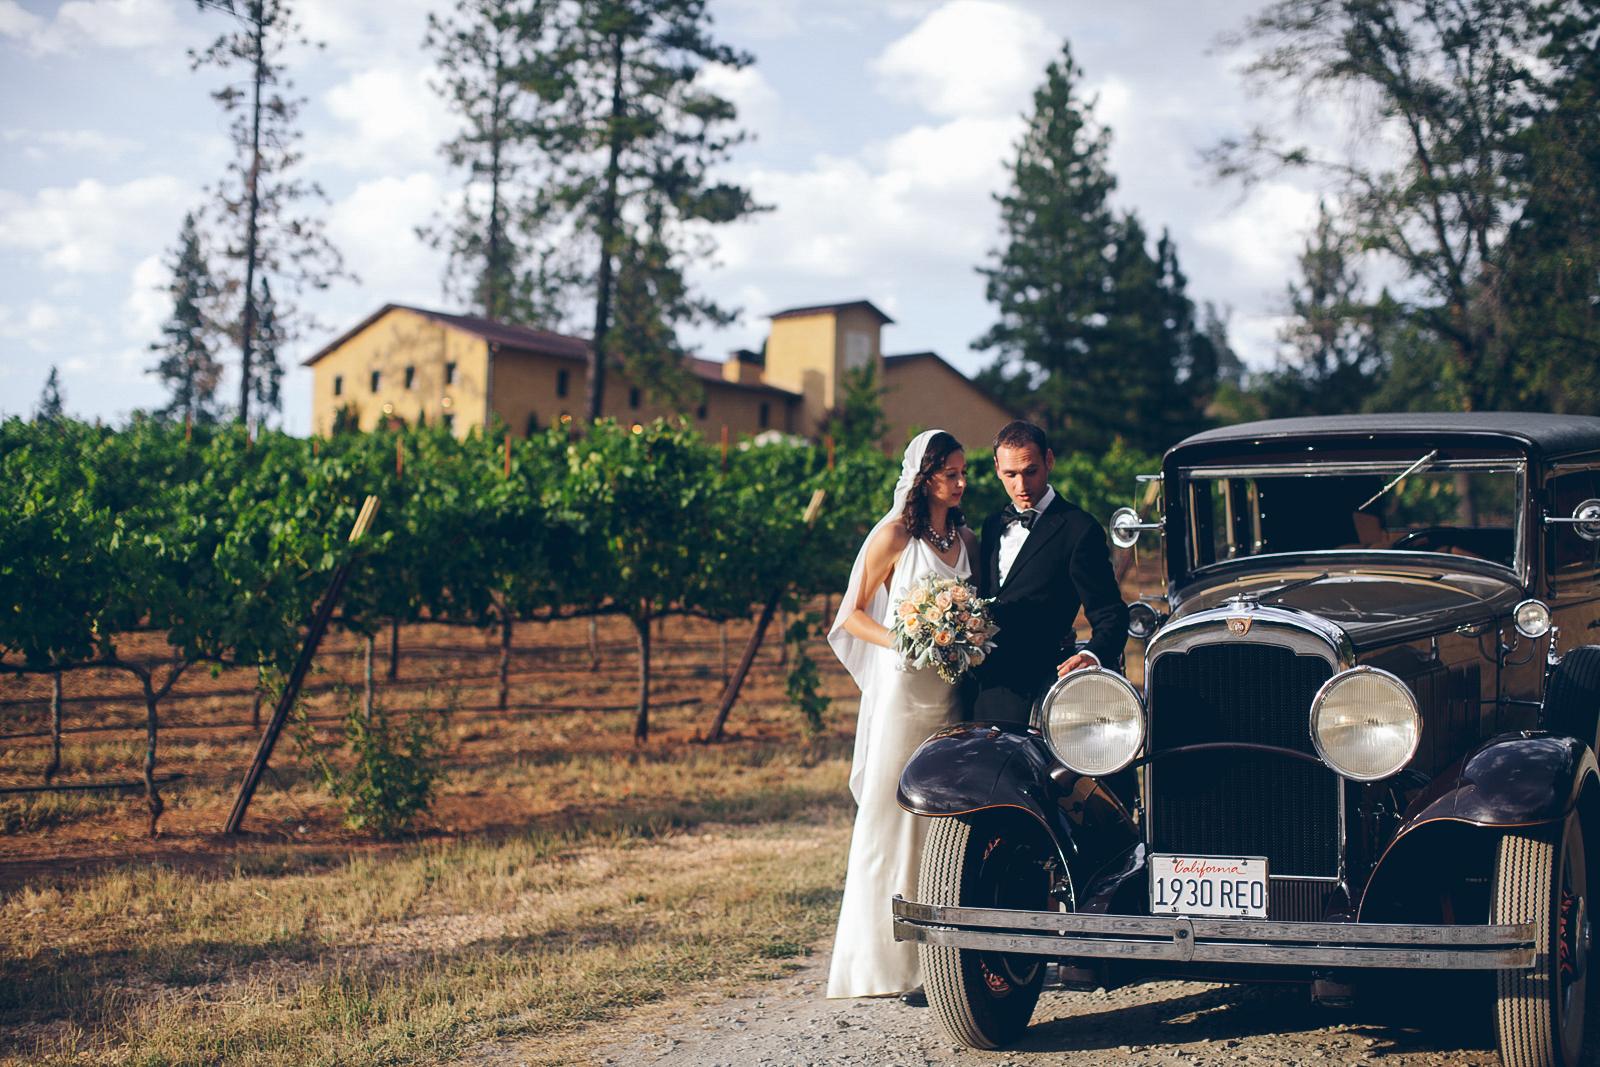 miraflores_winery_wedding_photography_ian_melissa_ebony_siovhan_bokeh_photography_39.jpg